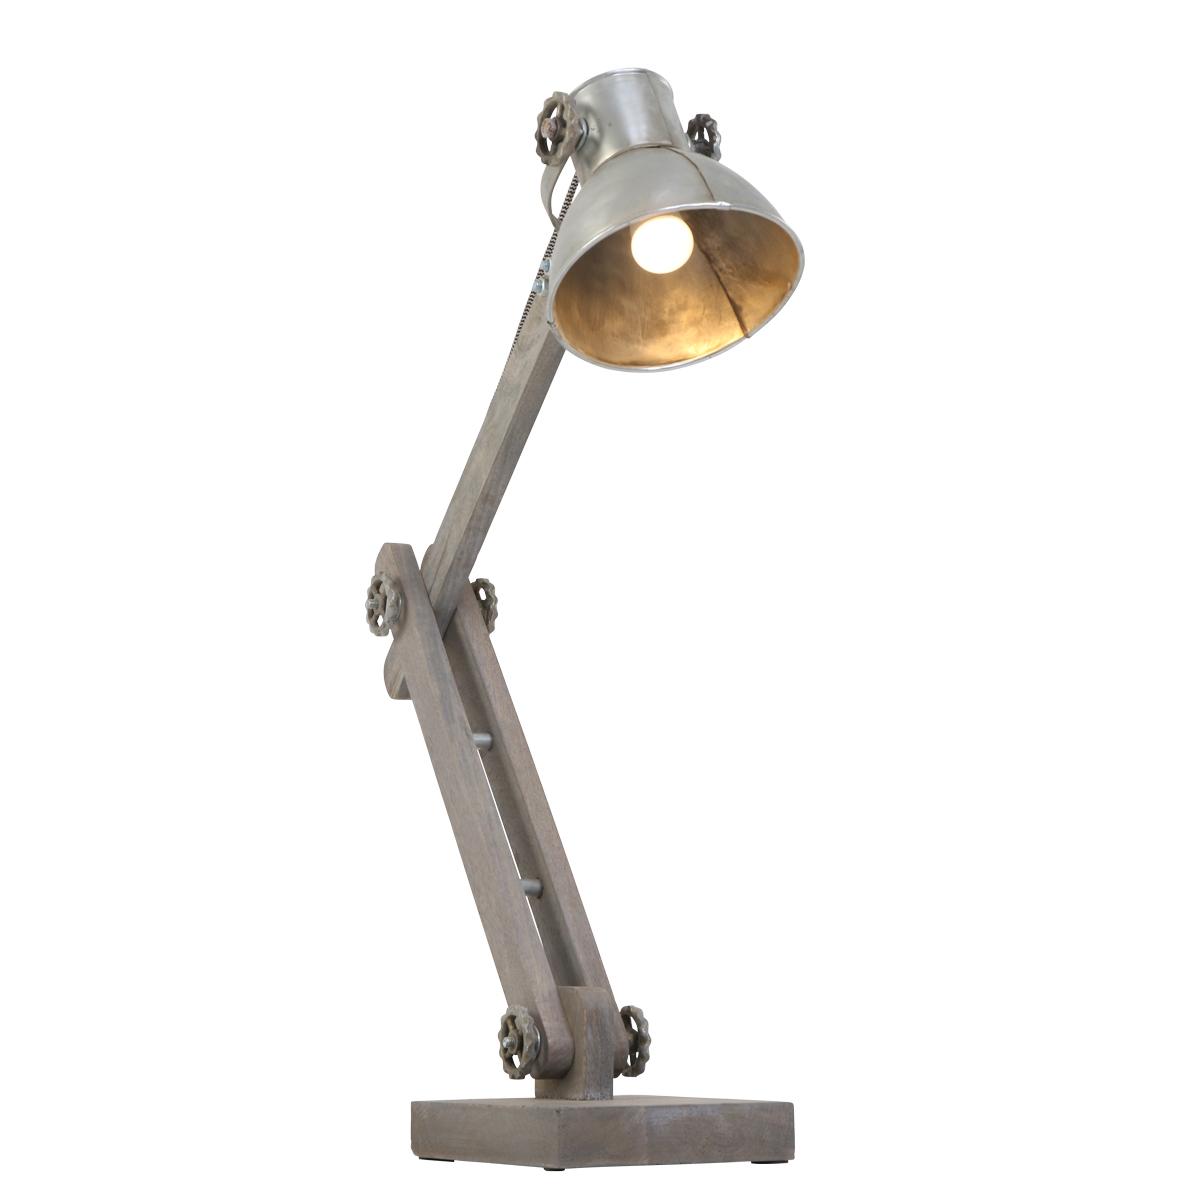 Trendige Robuste Tischlampe Robusto Silber